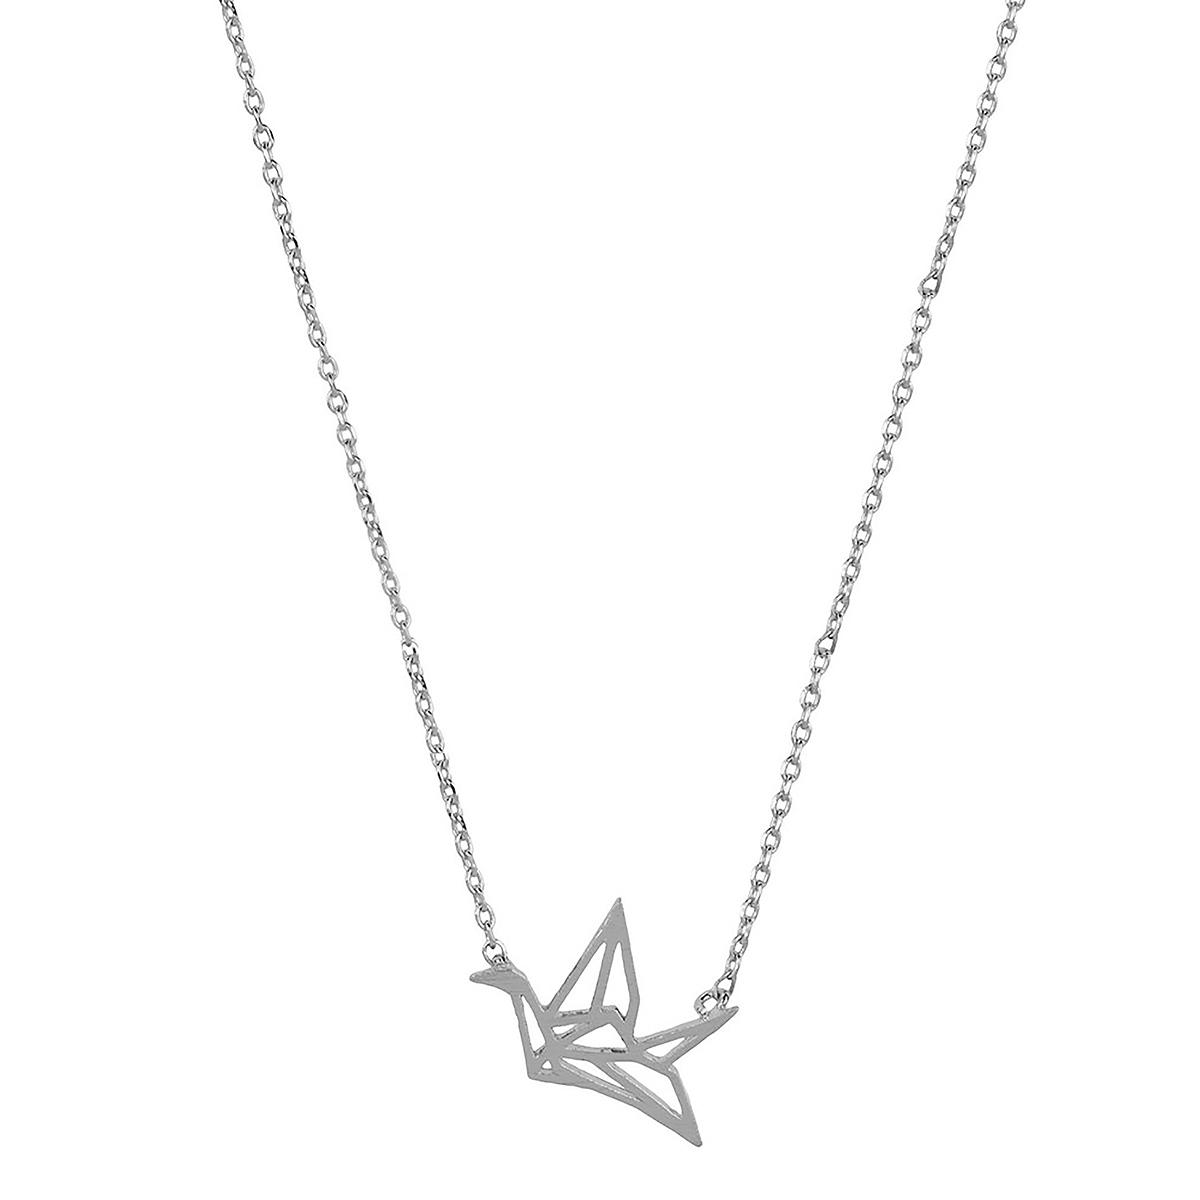 Silver bird origami necklace